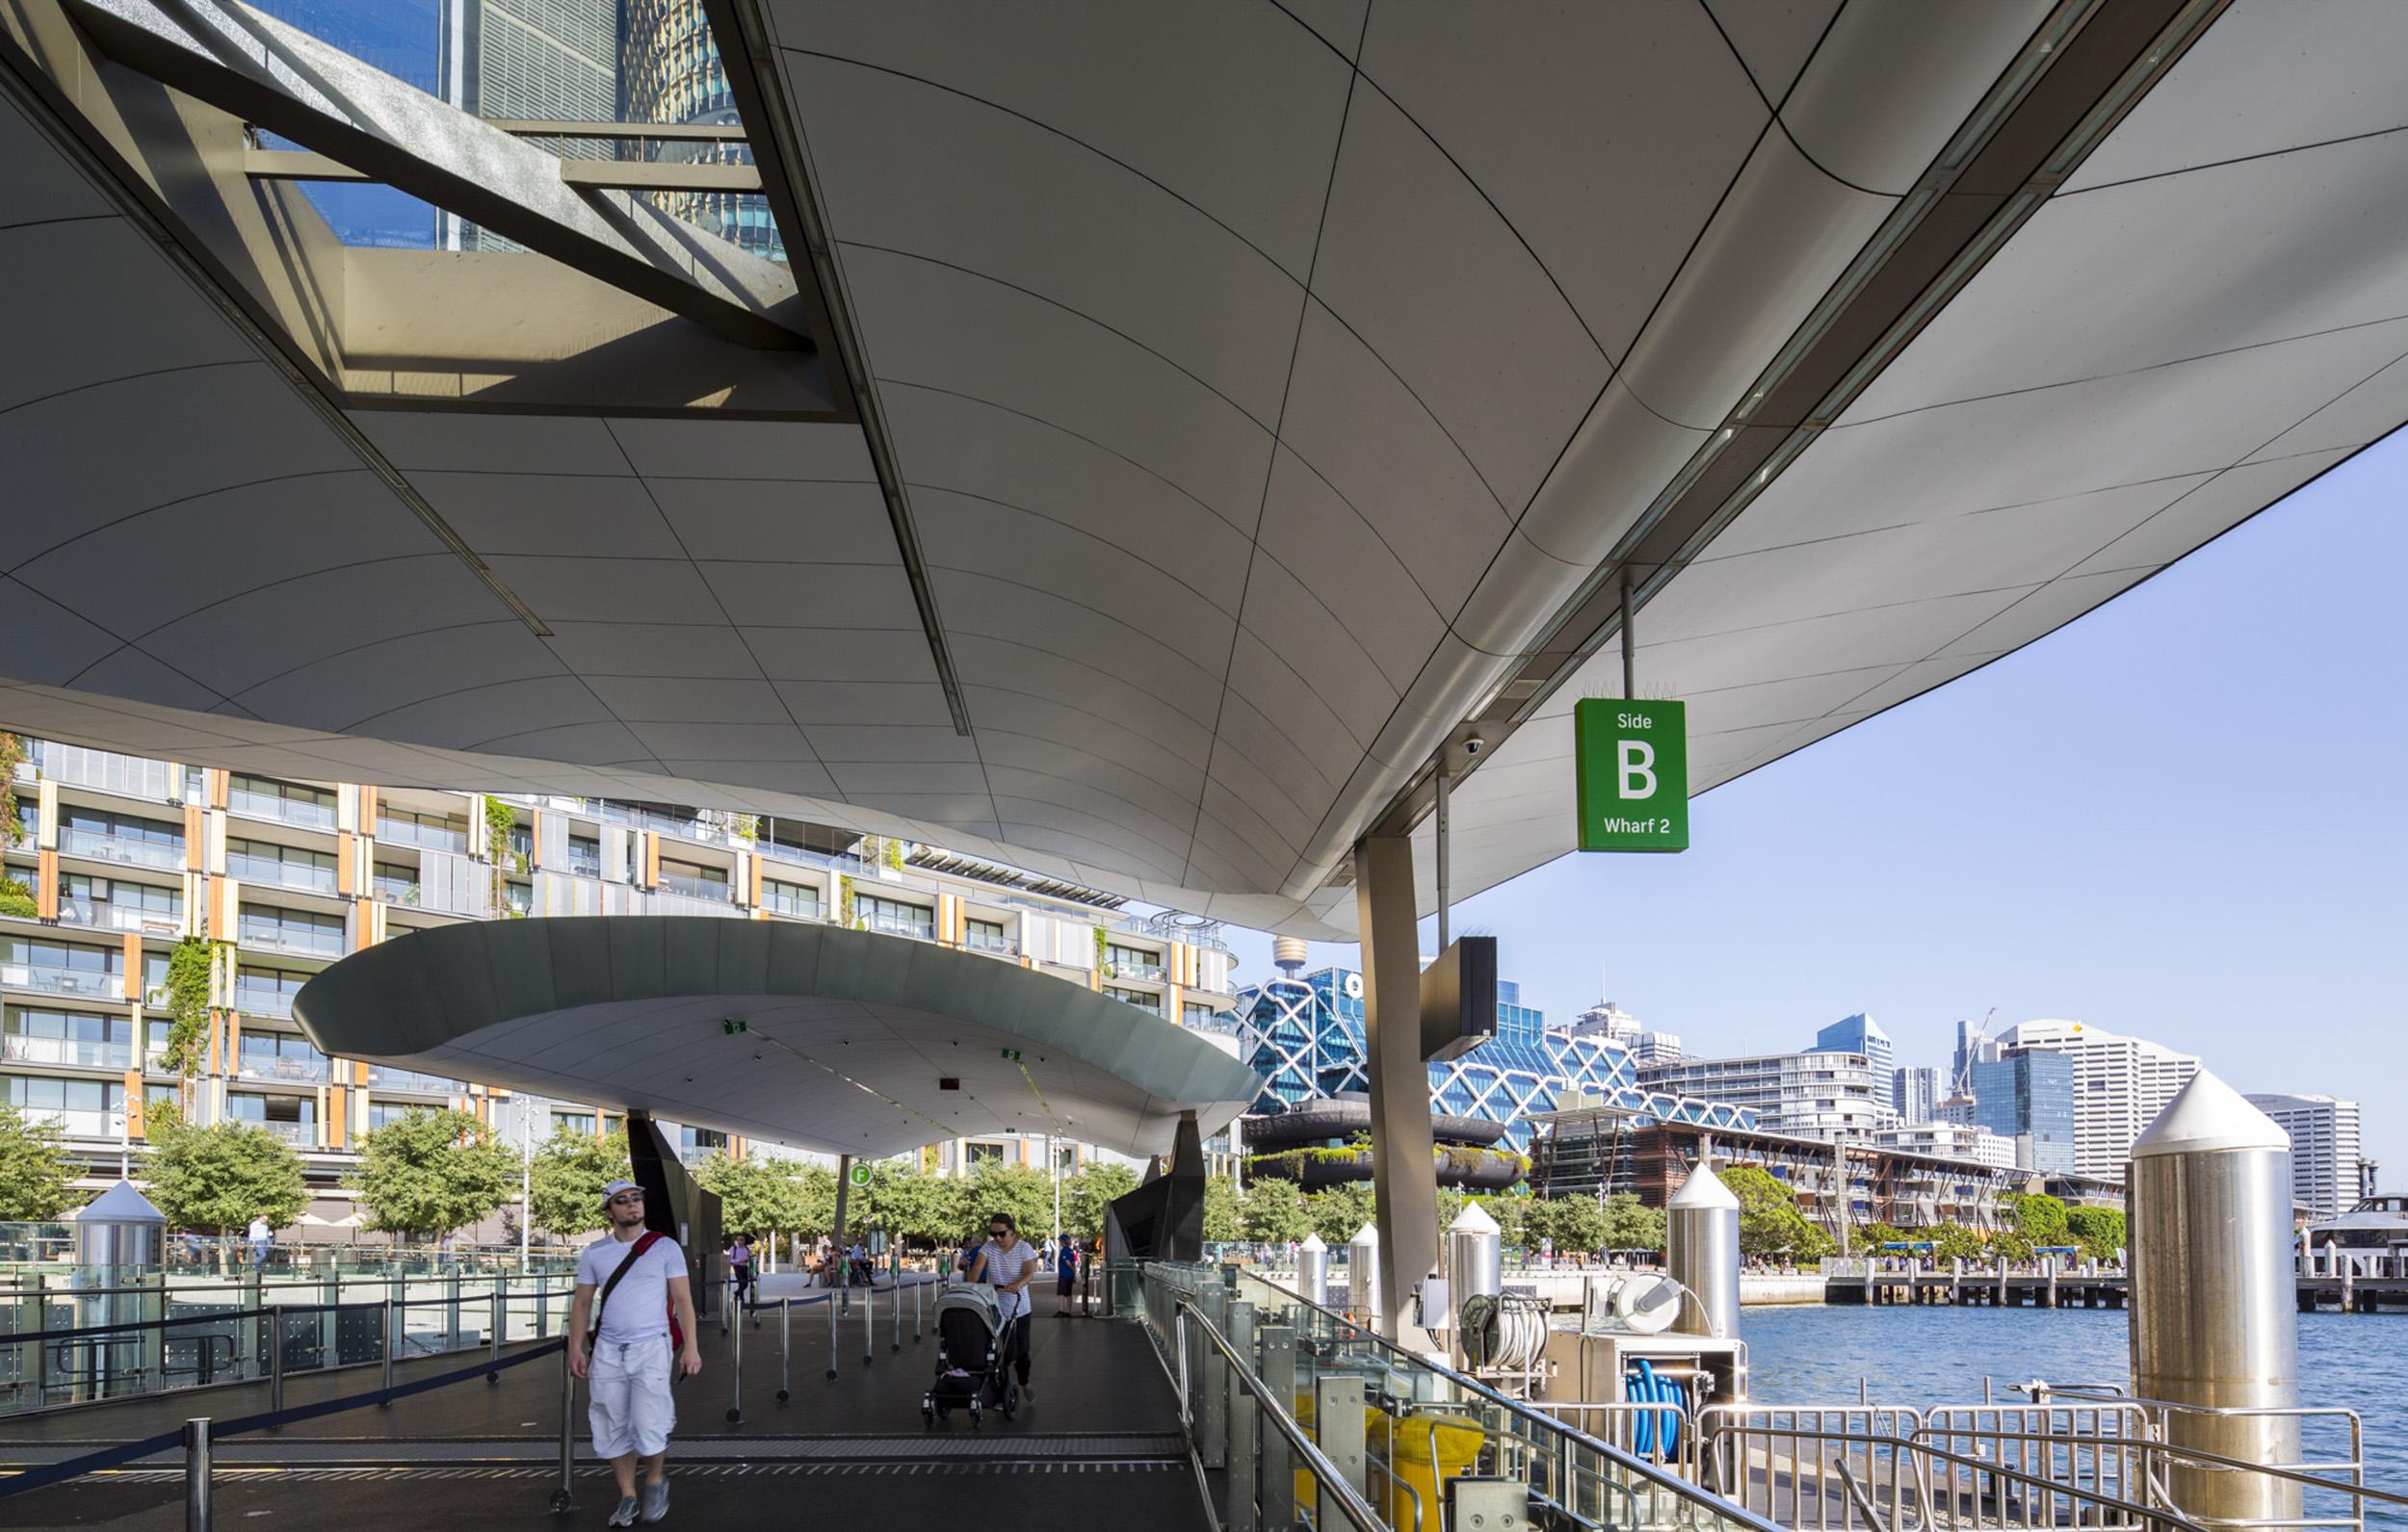 Barangaroo_wharf_cox_architecture_sydney_03.jpg